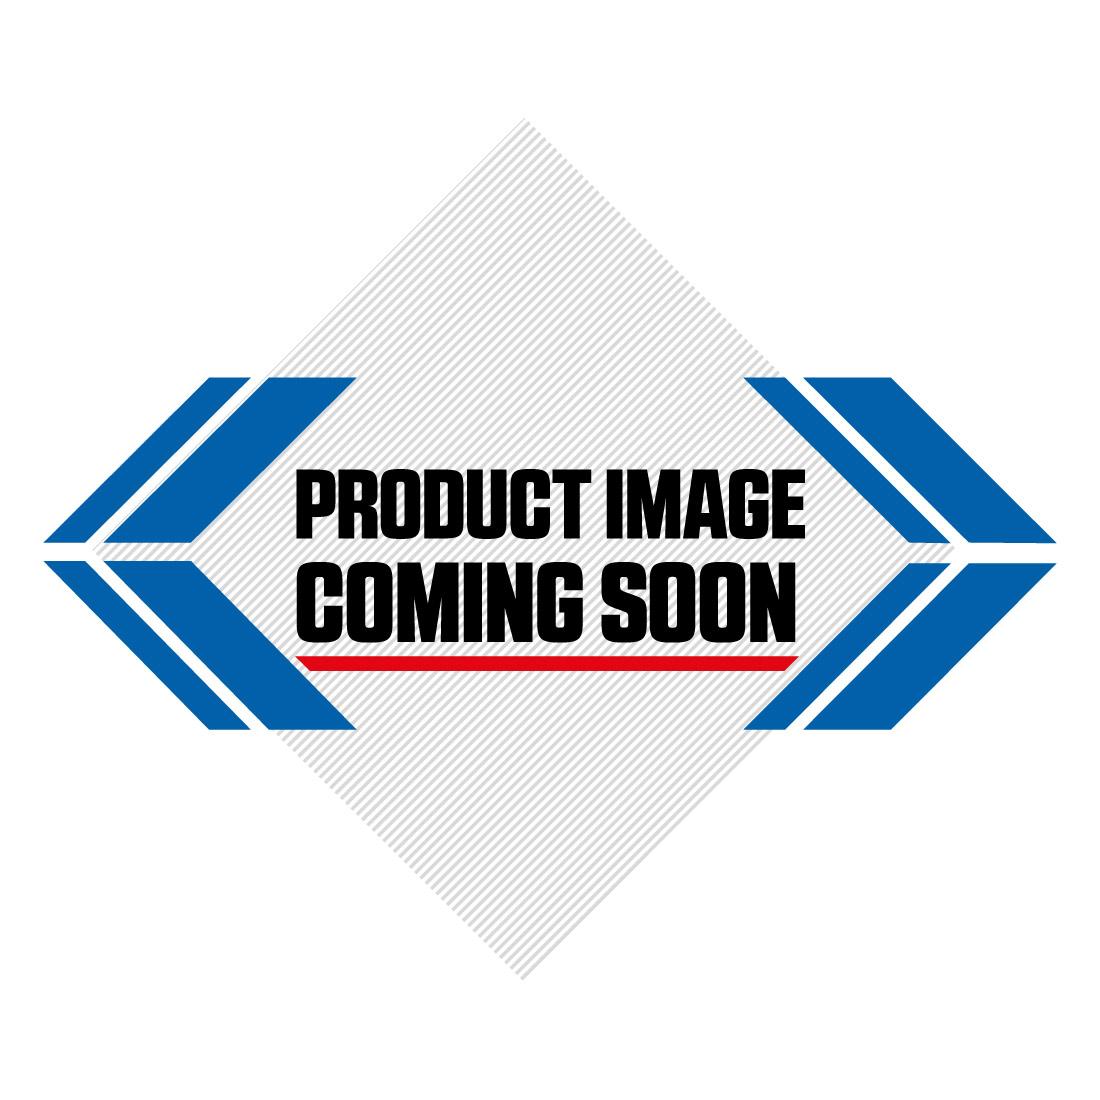 Suzuki Plastic Kit RMZ 450 (08-17) OEM Factory Image-5>